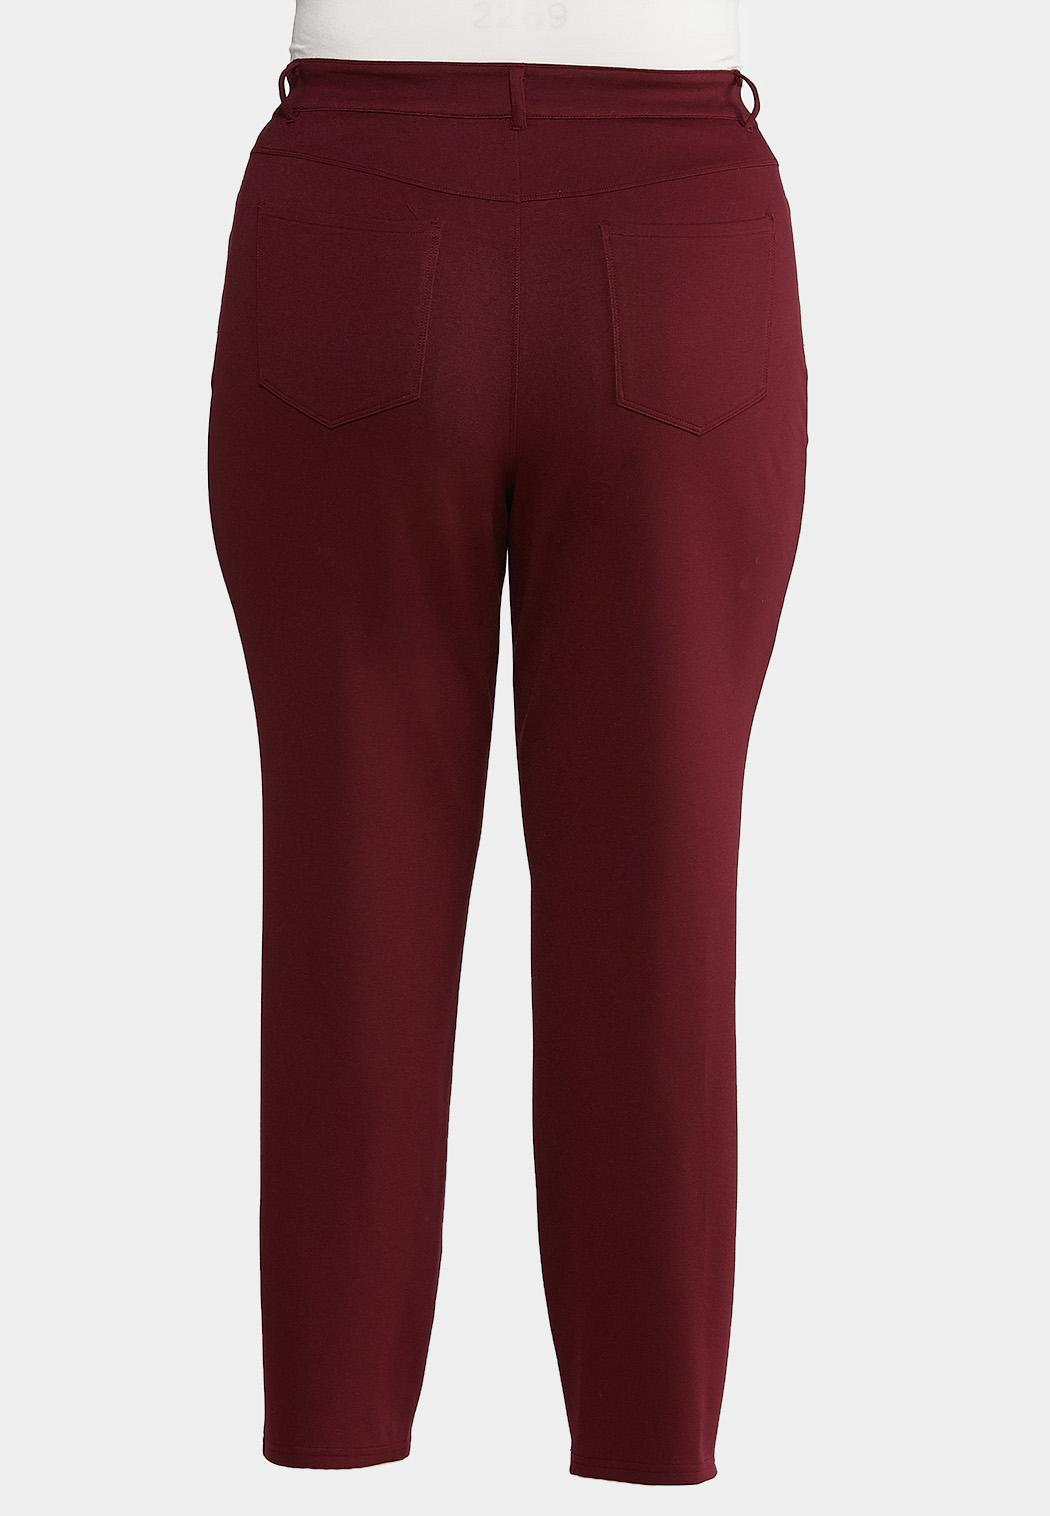 Plus Petite Skinny Leg Ponte Pants (Item #43918291)